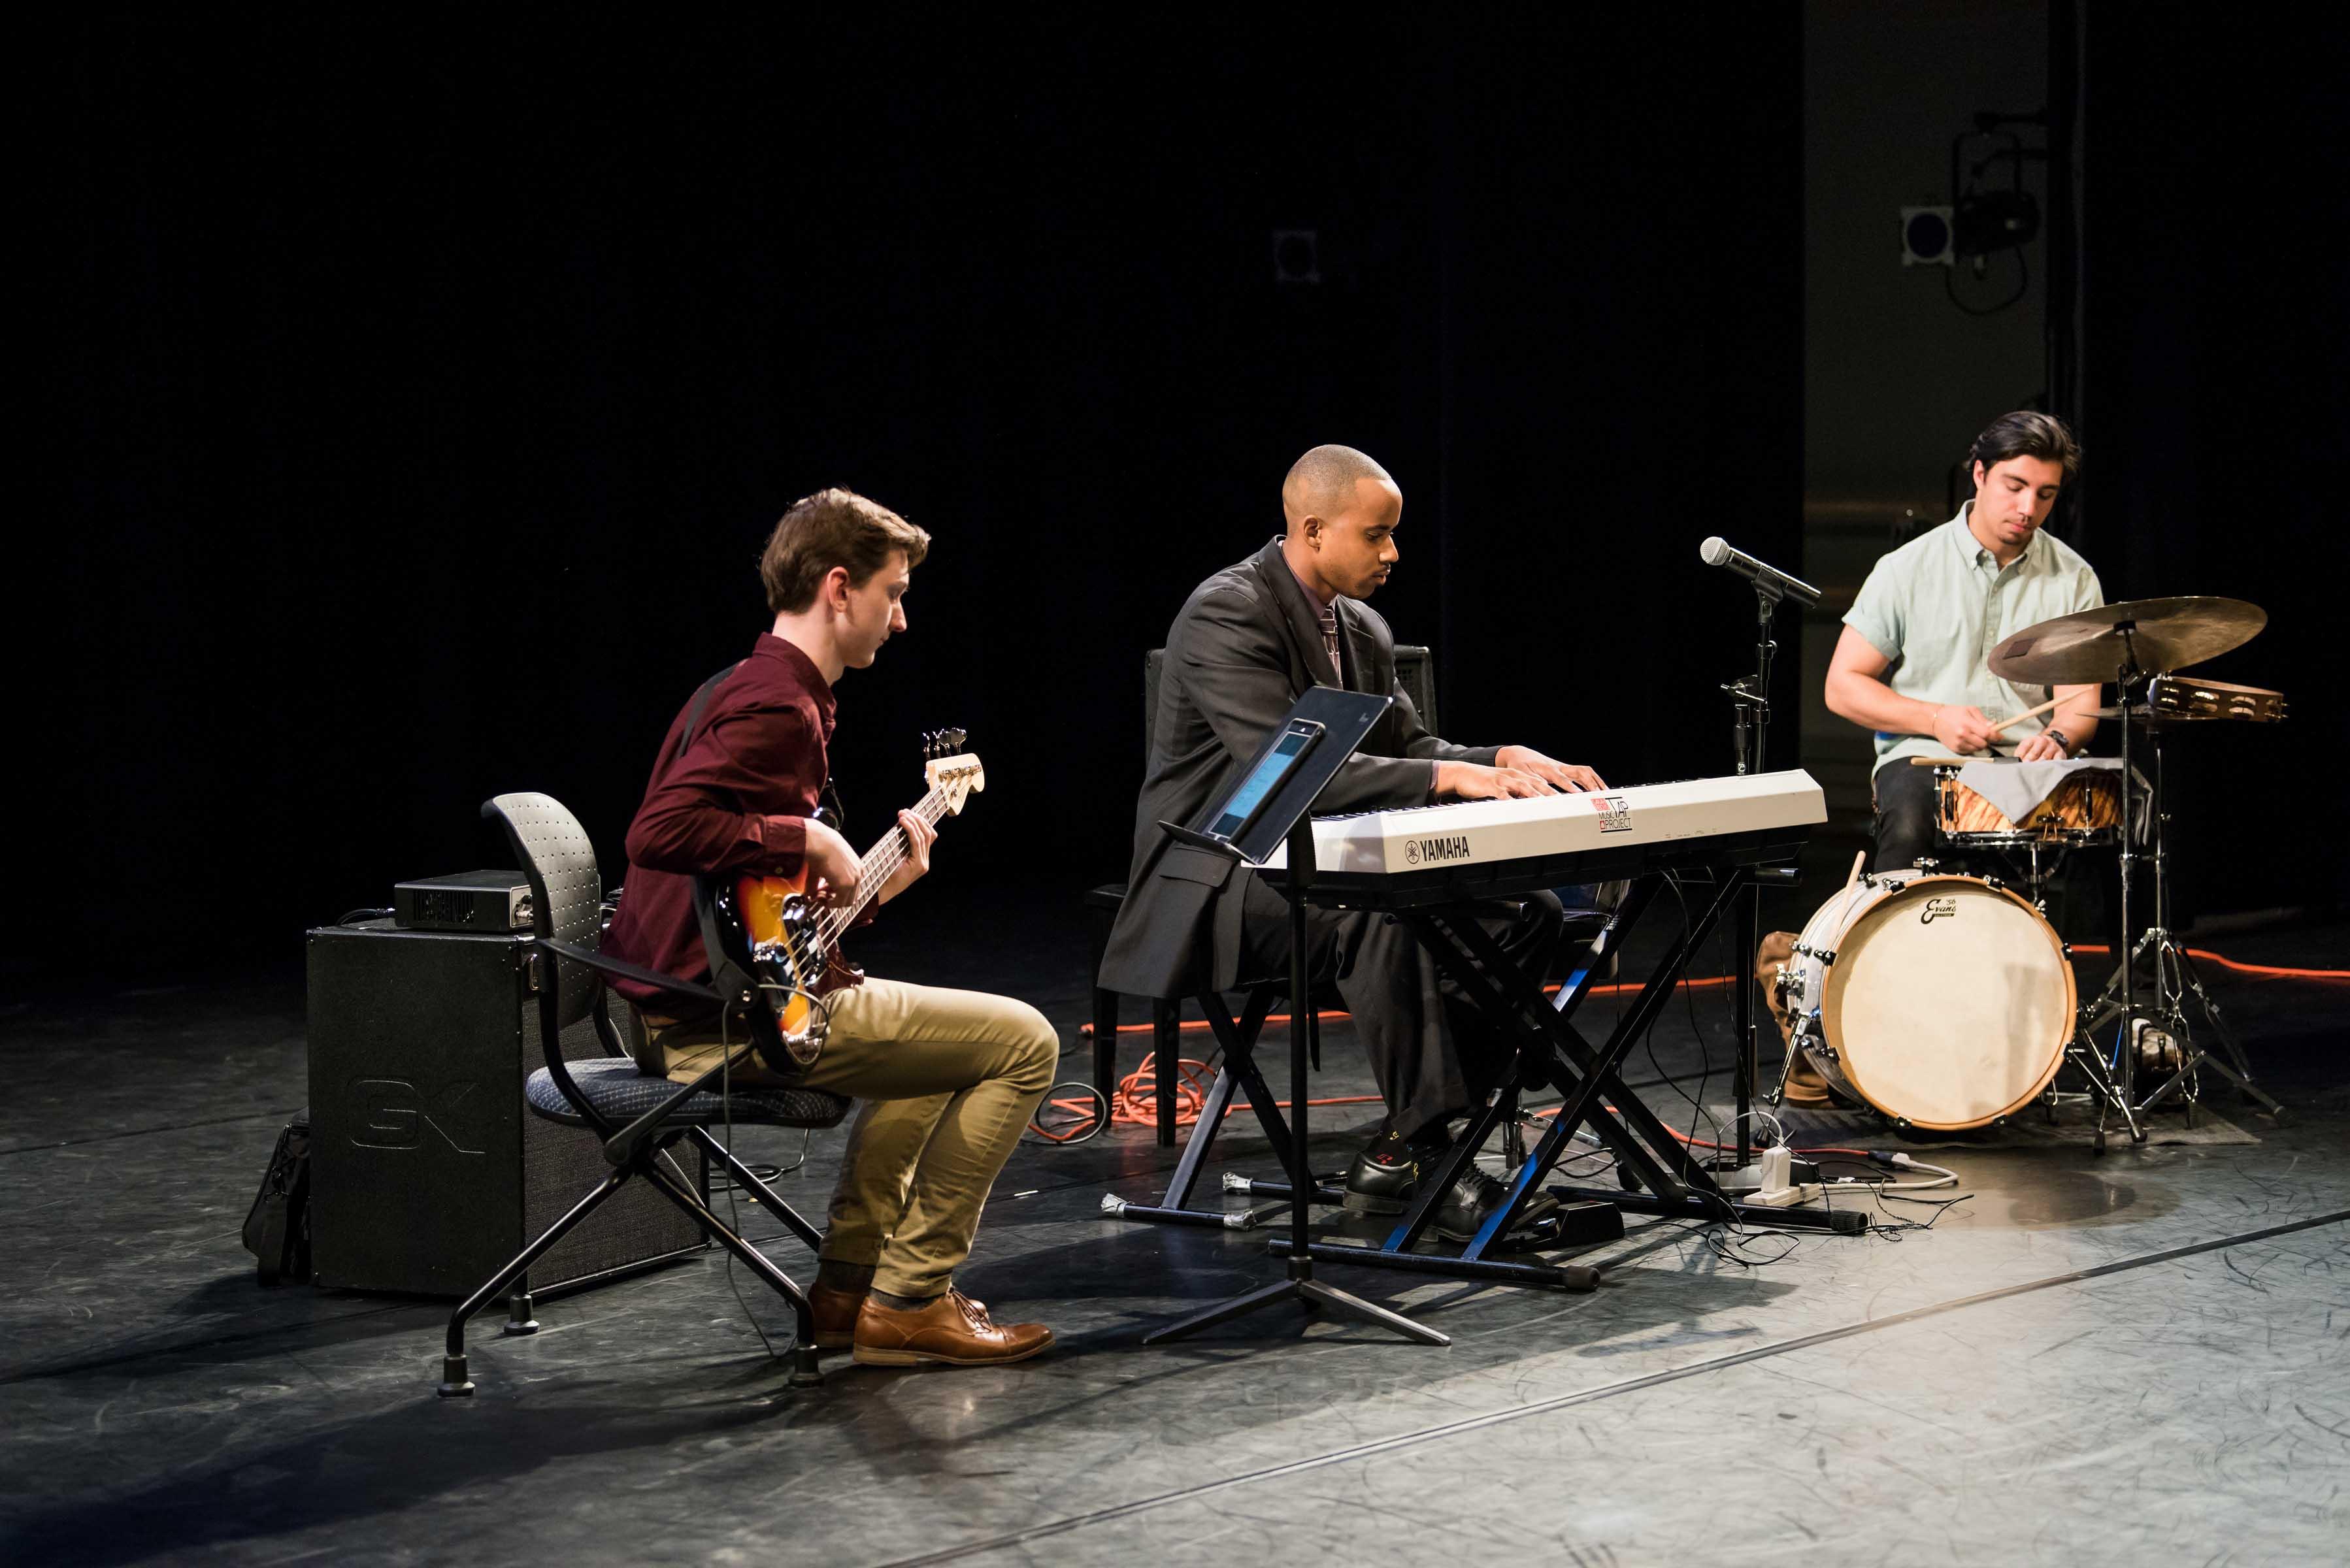 Ellington Carthan music performance